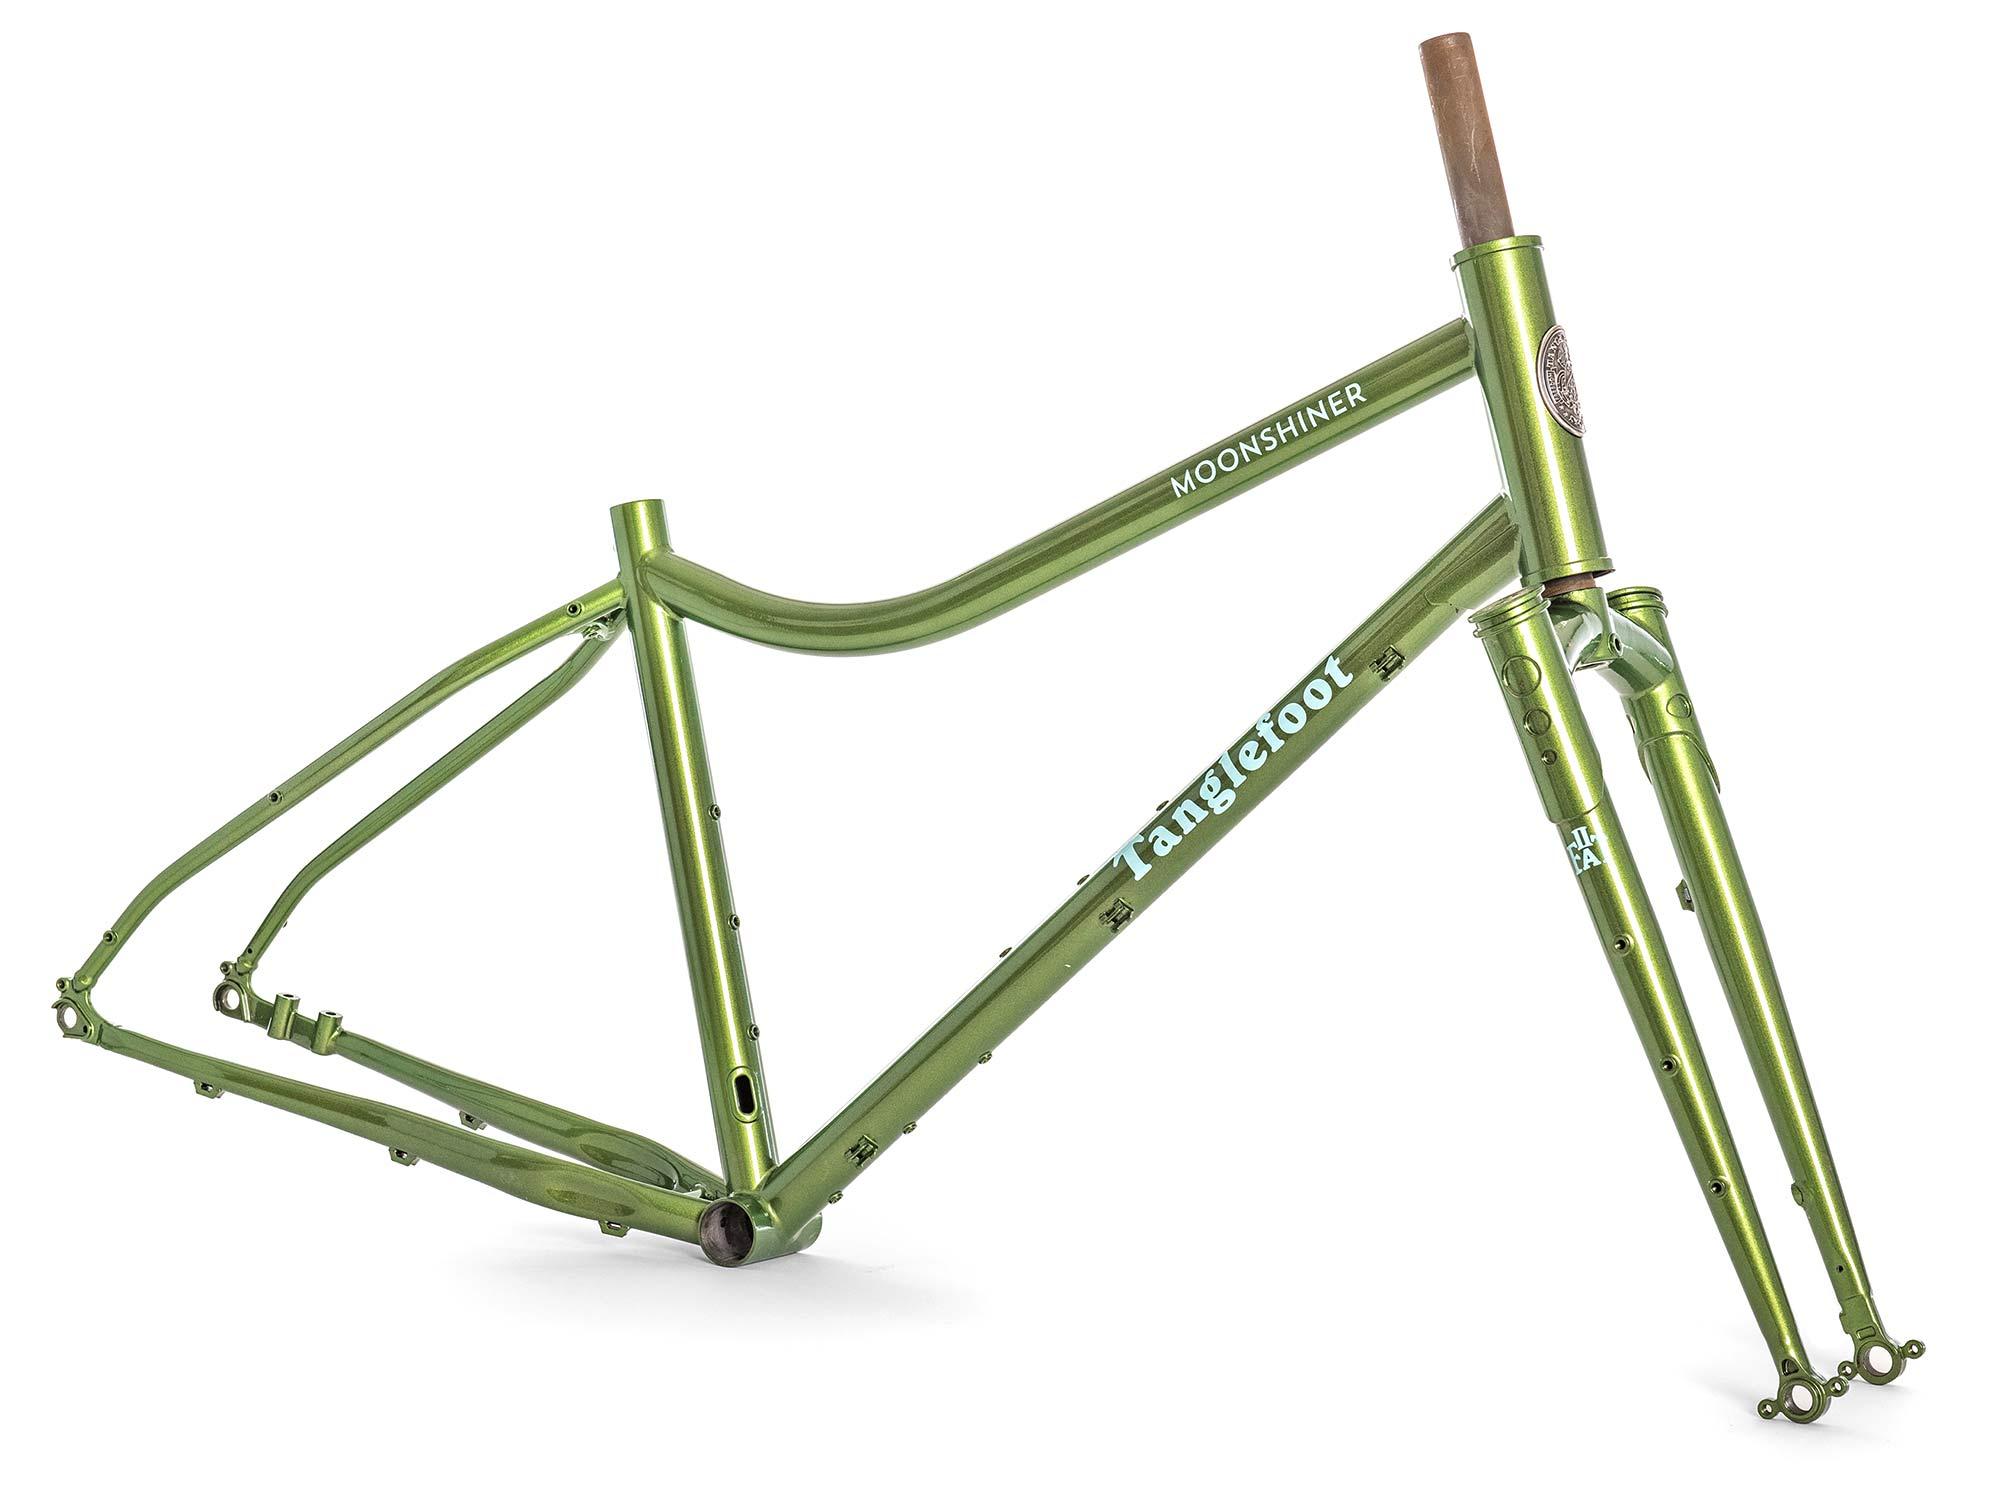 Tanglefoot Moonshiner MTB, 27.5+ rigid steel dropbar adventure touring bikepacking mountain bike,frame